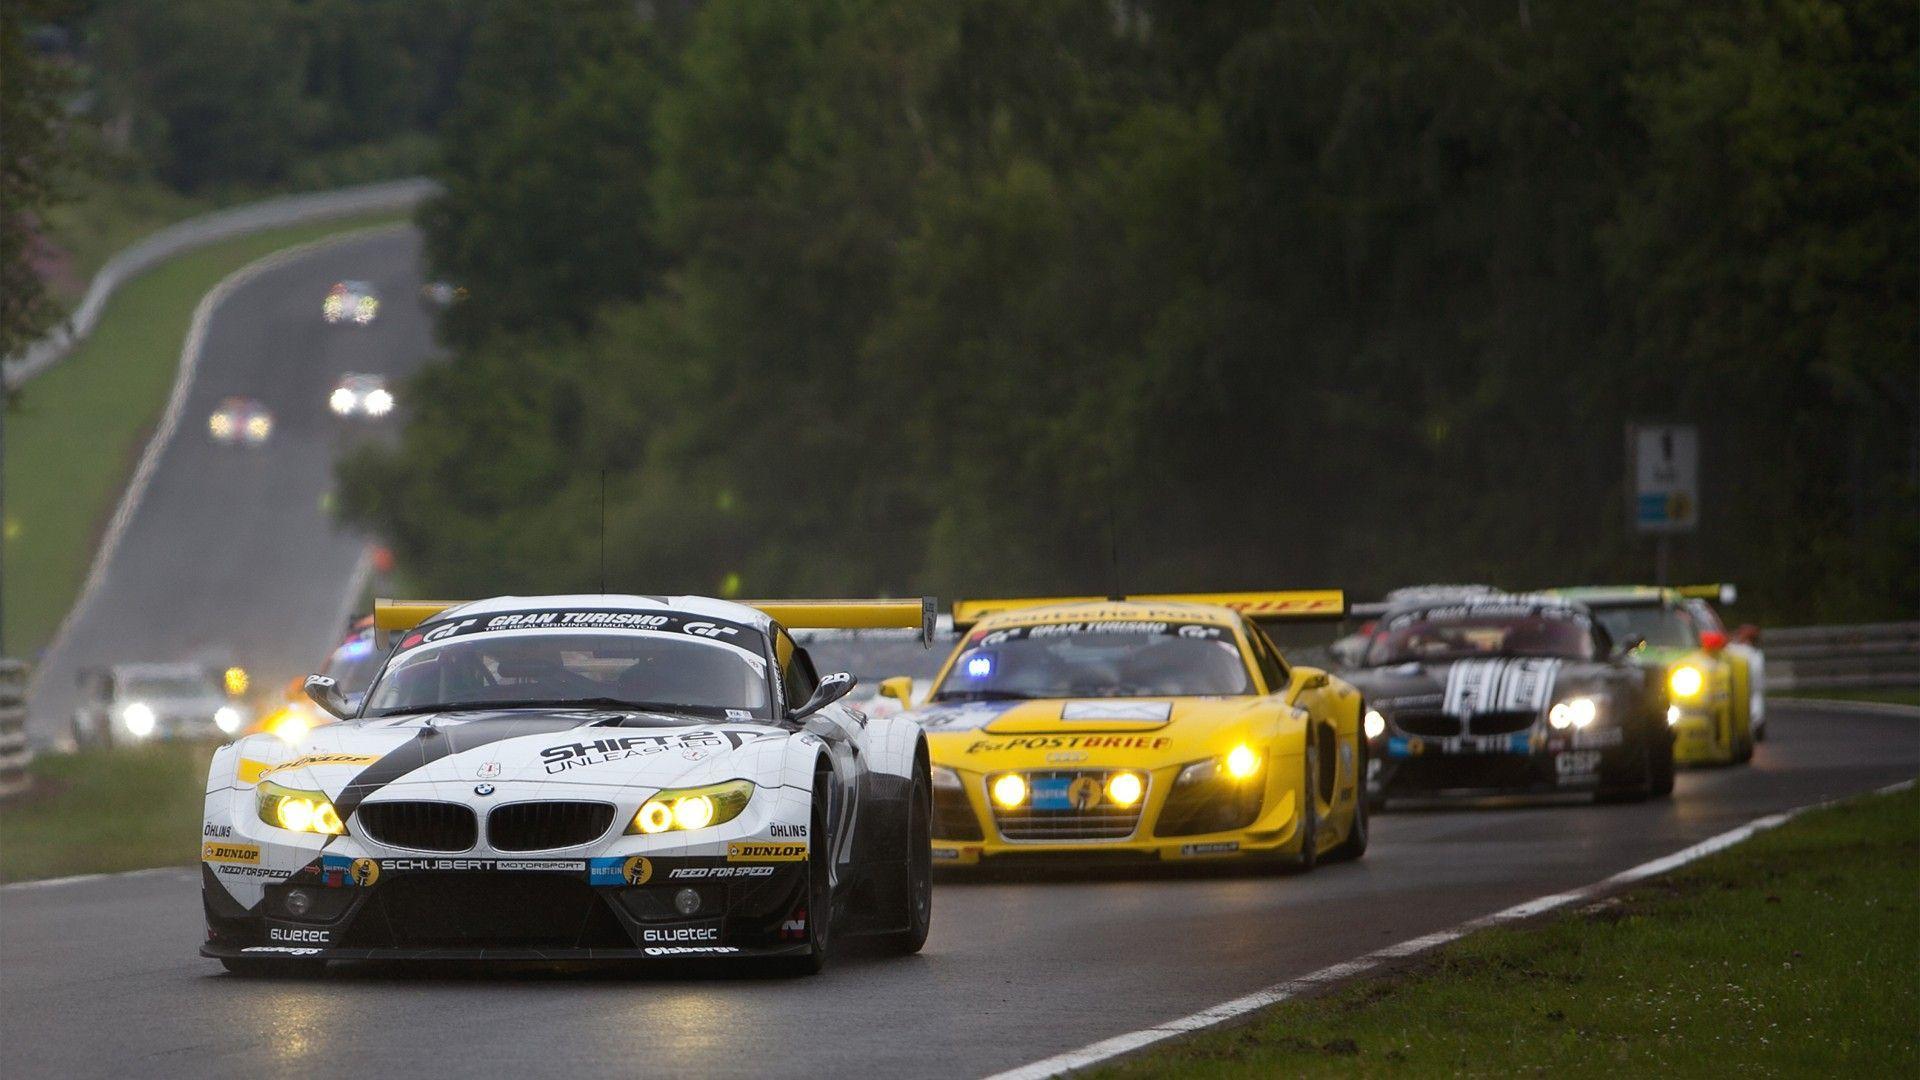 Racing Car Hd Wallpapers Top Free Racing Car Hd Backgrounds